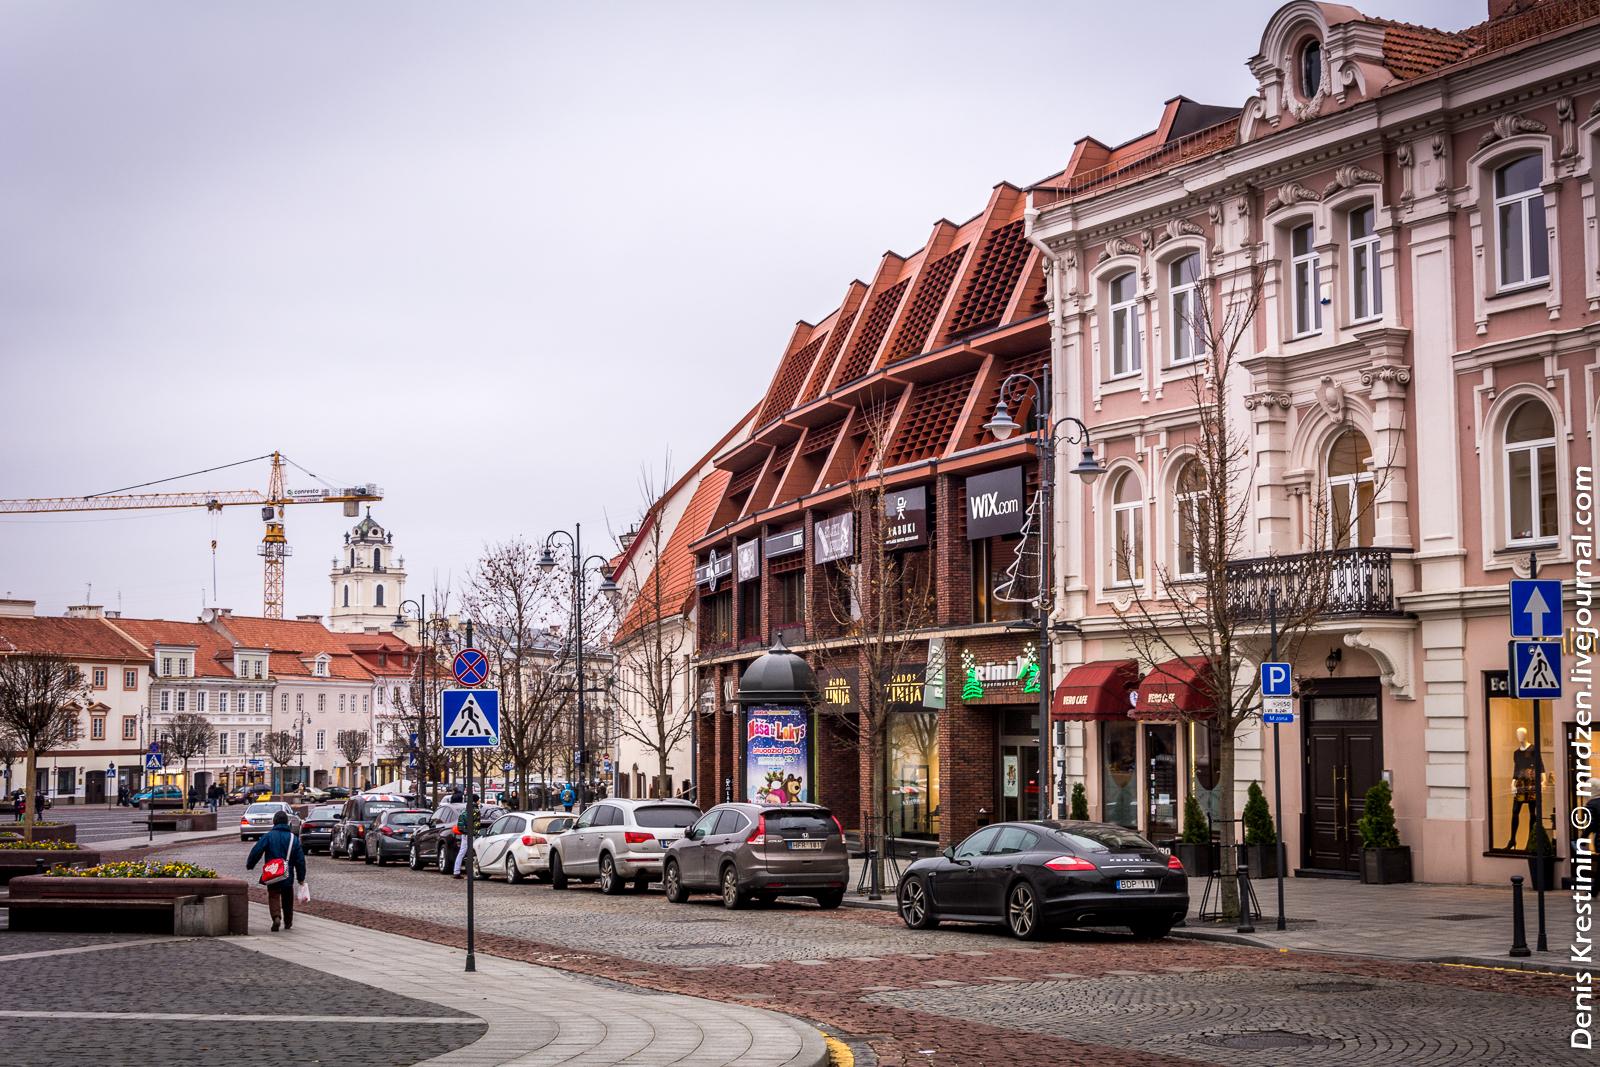 Вильнюс. Старый город. Улица Пилес.